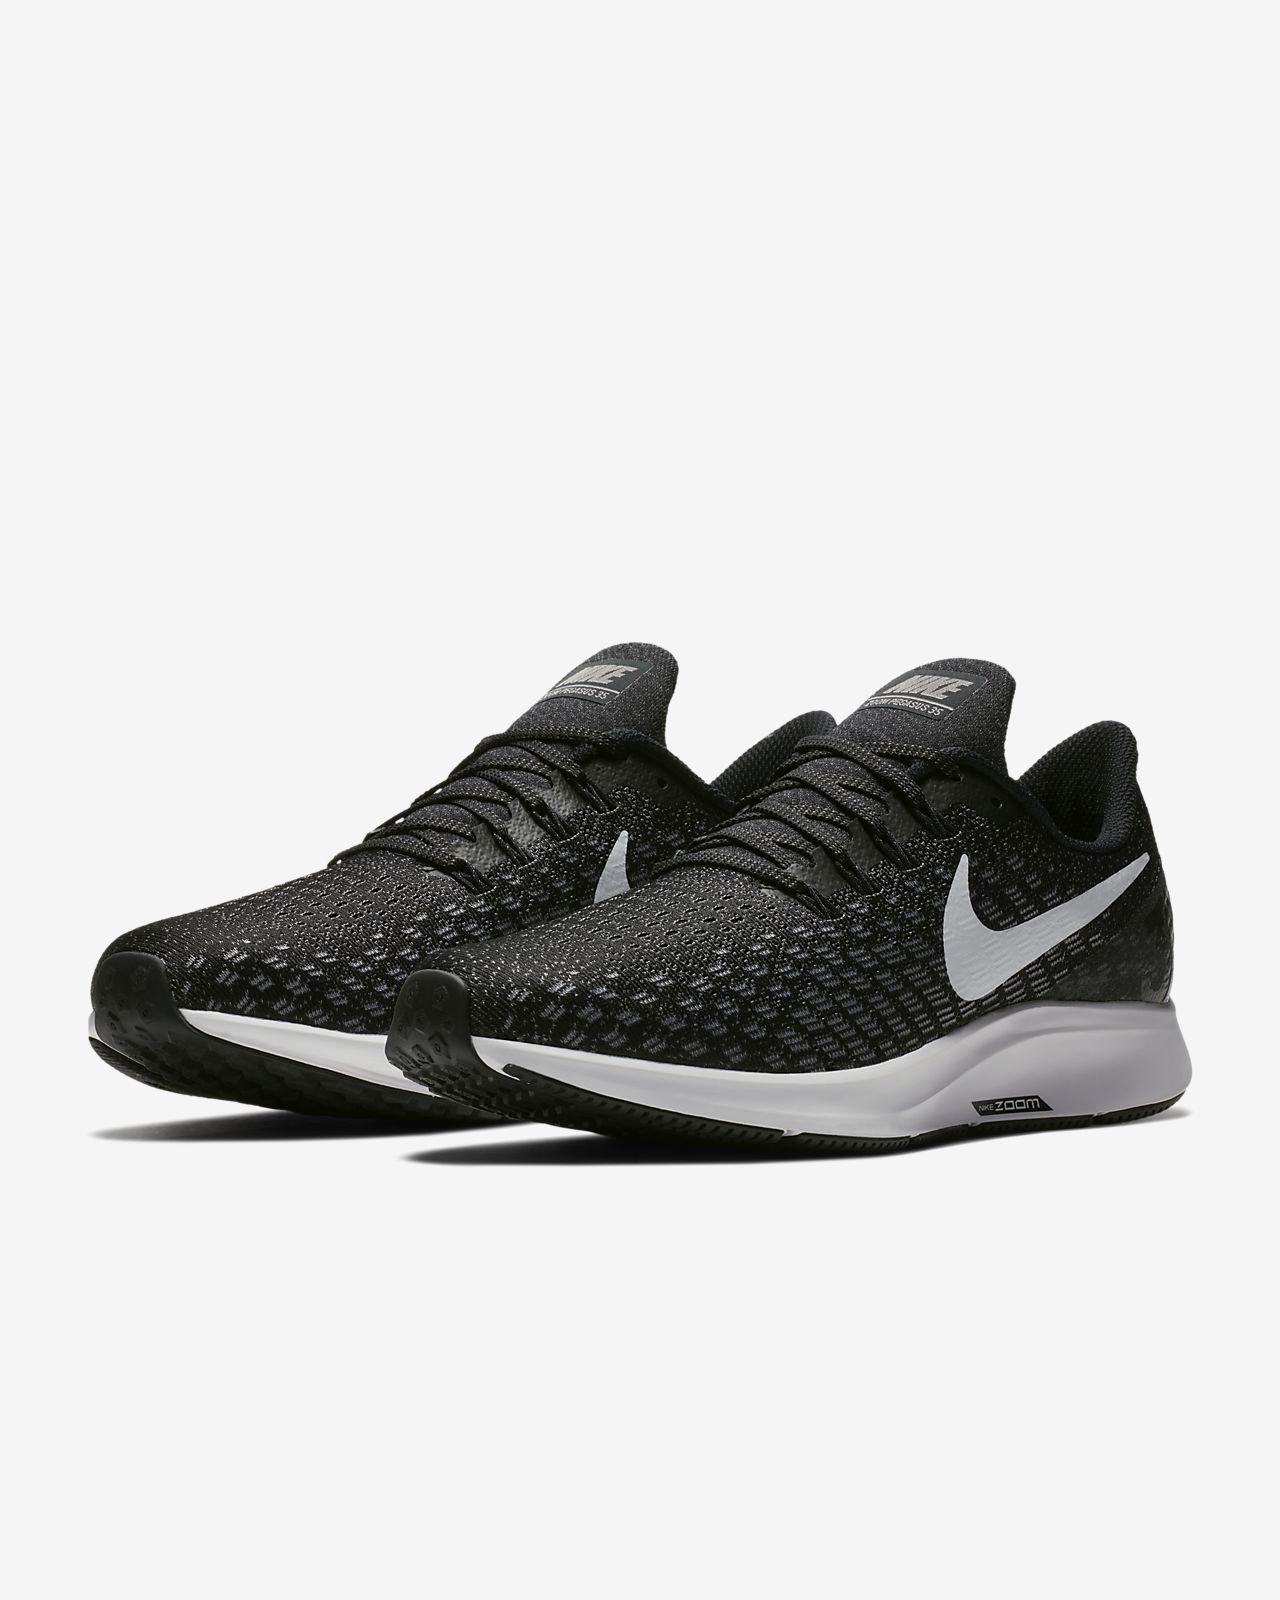 promo code a57bf e3a0d ... Chaussure de running Nike Air Zoom Pegasus 35 pour Homme